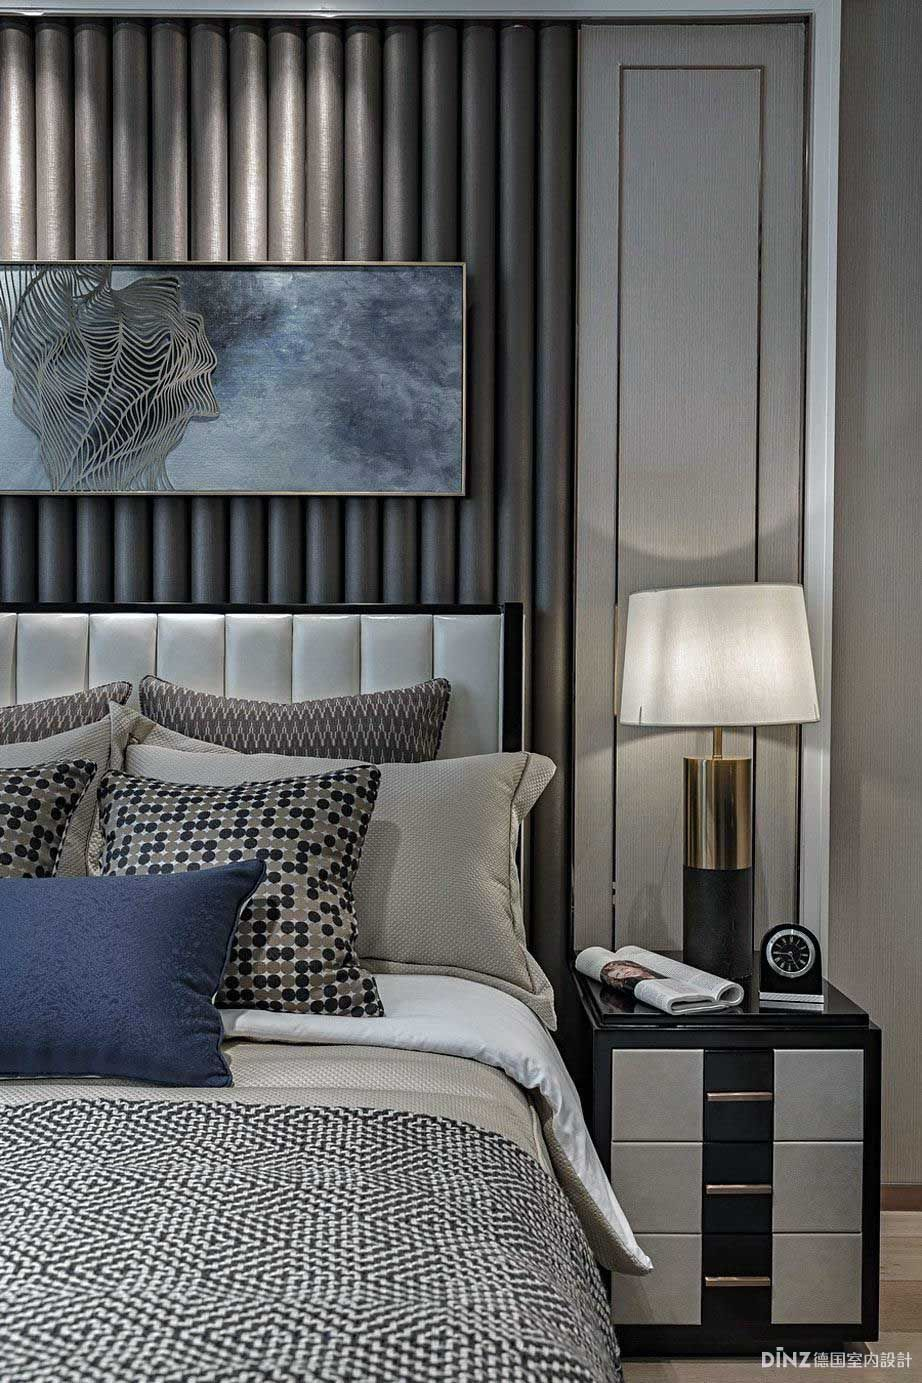 38 Luxury Modern Apartment Bedroom Ideas Modern Bedroom Decor Luxurious Bedrooms Master Bedroom Design